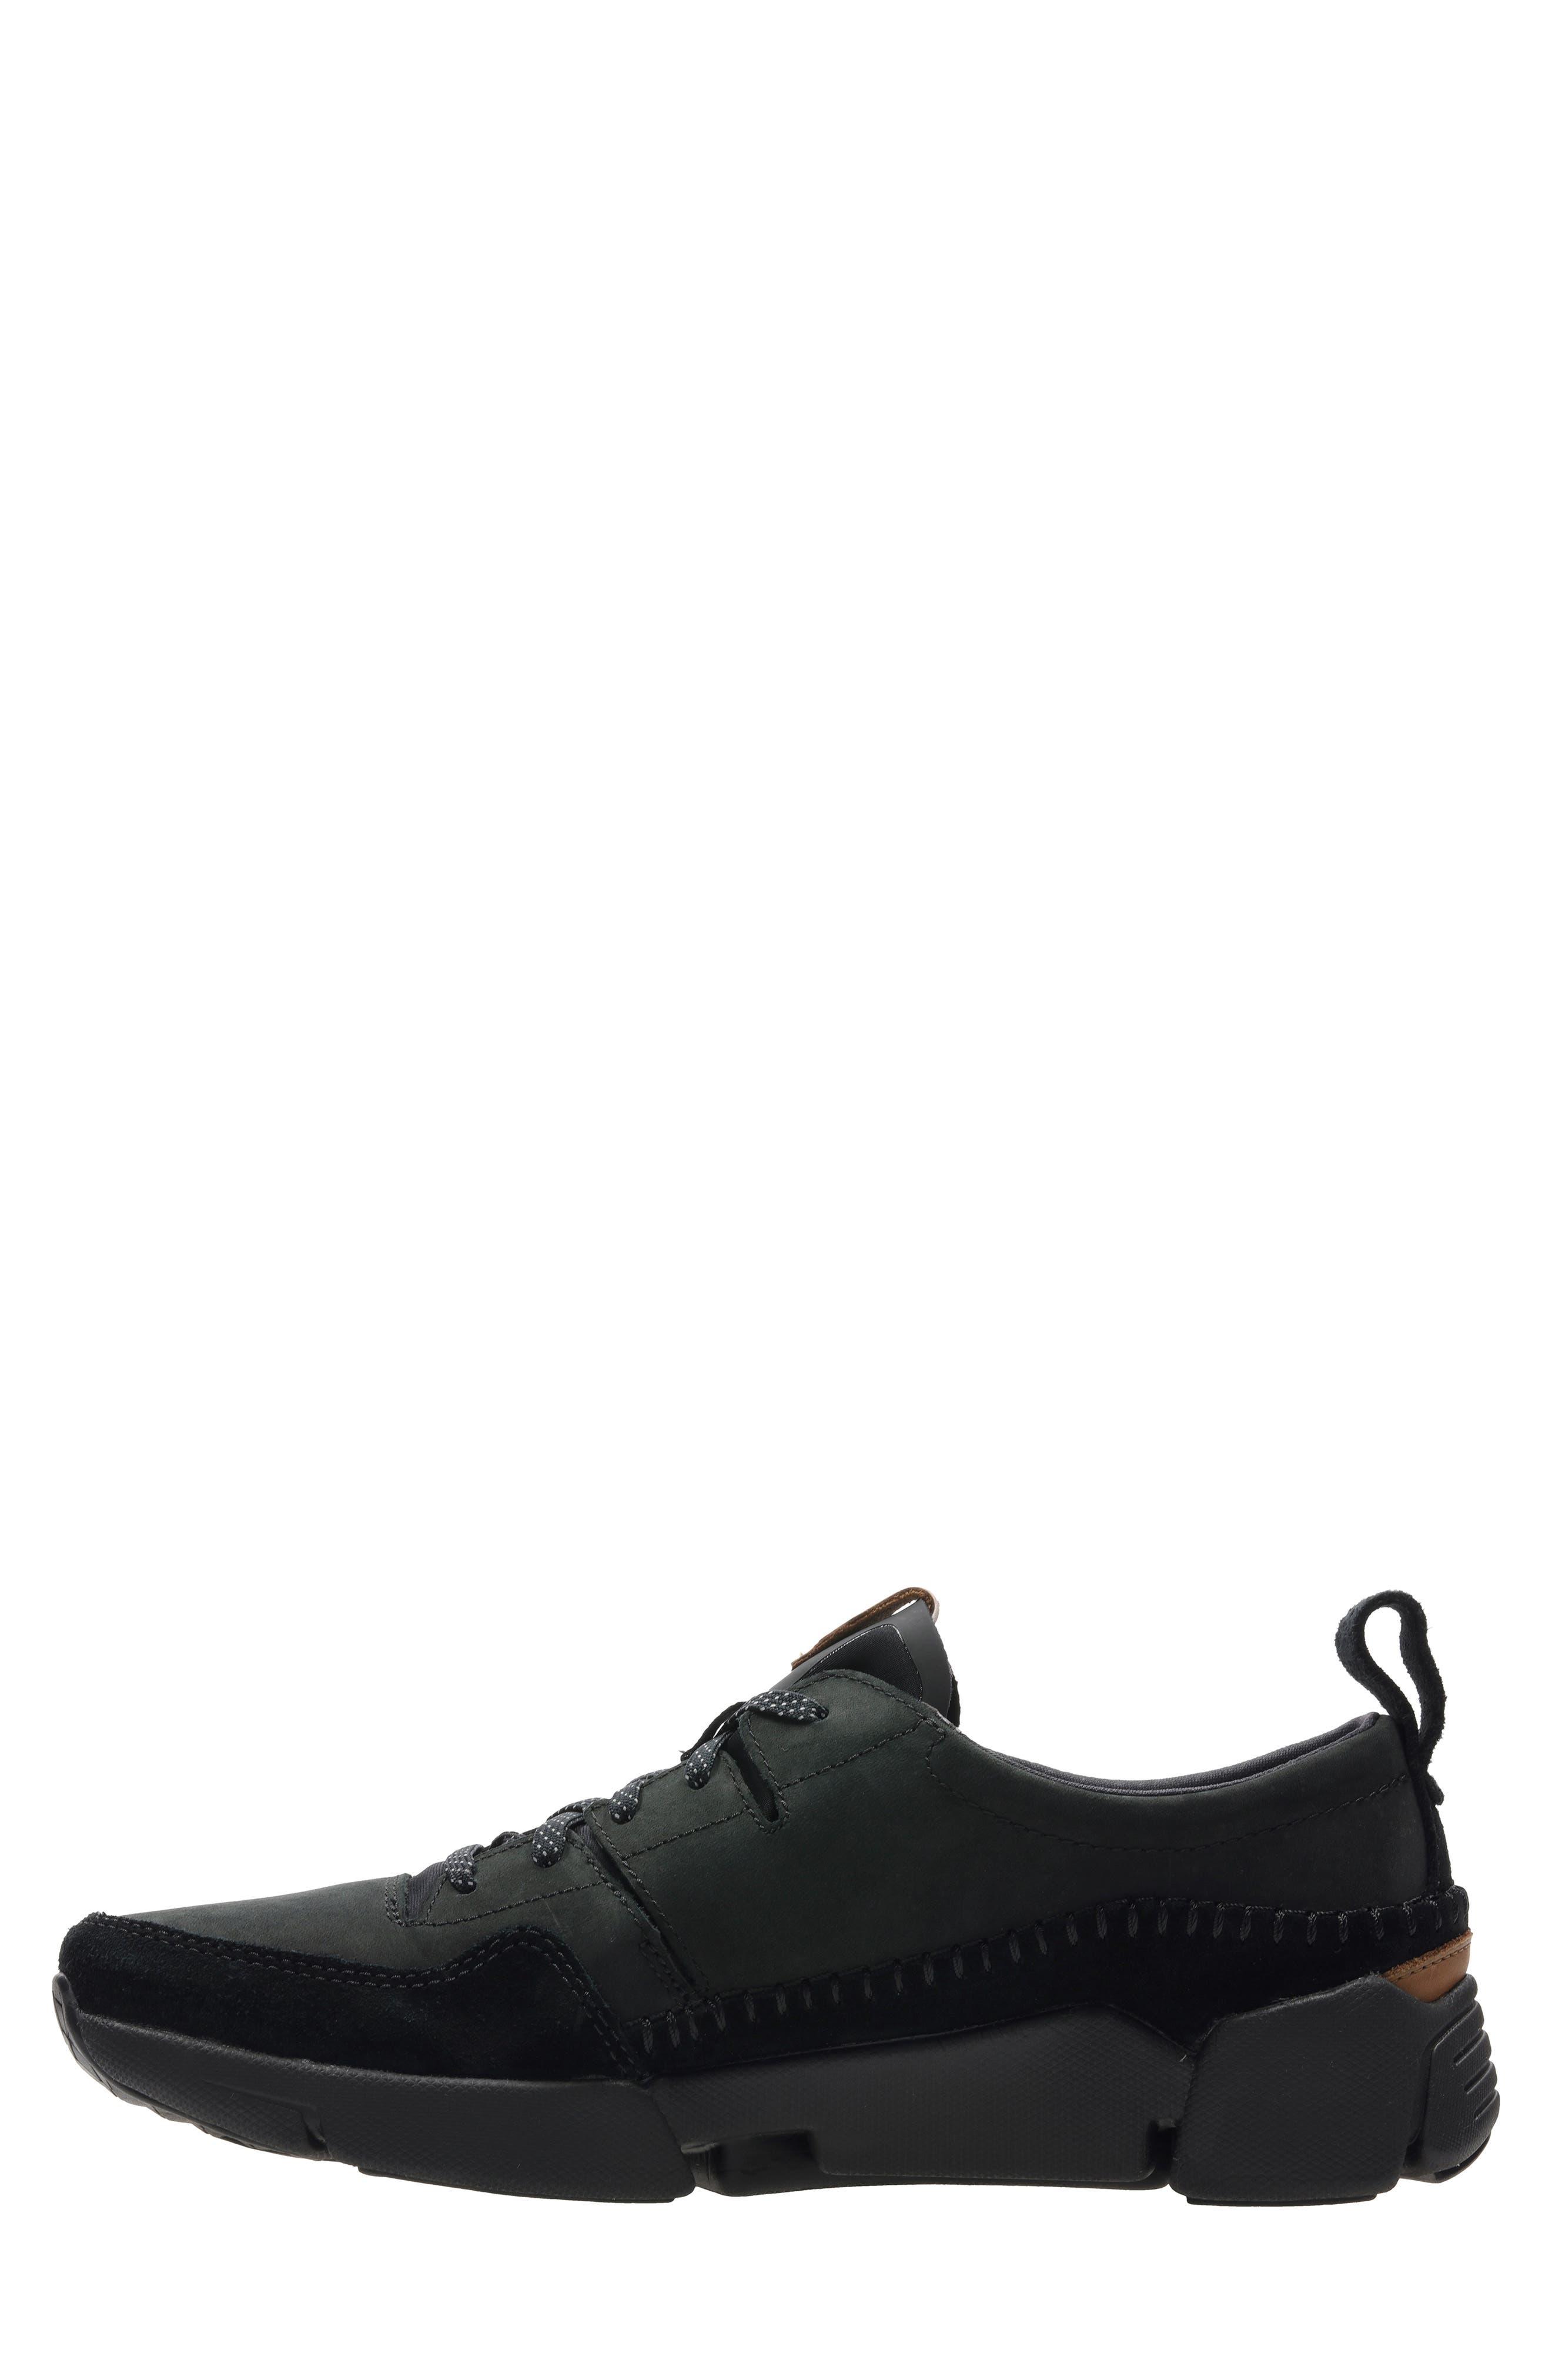 Tri-Active Run Sneaker,                             Alternate thumbnail 7, color,                             BLACK LEATHER